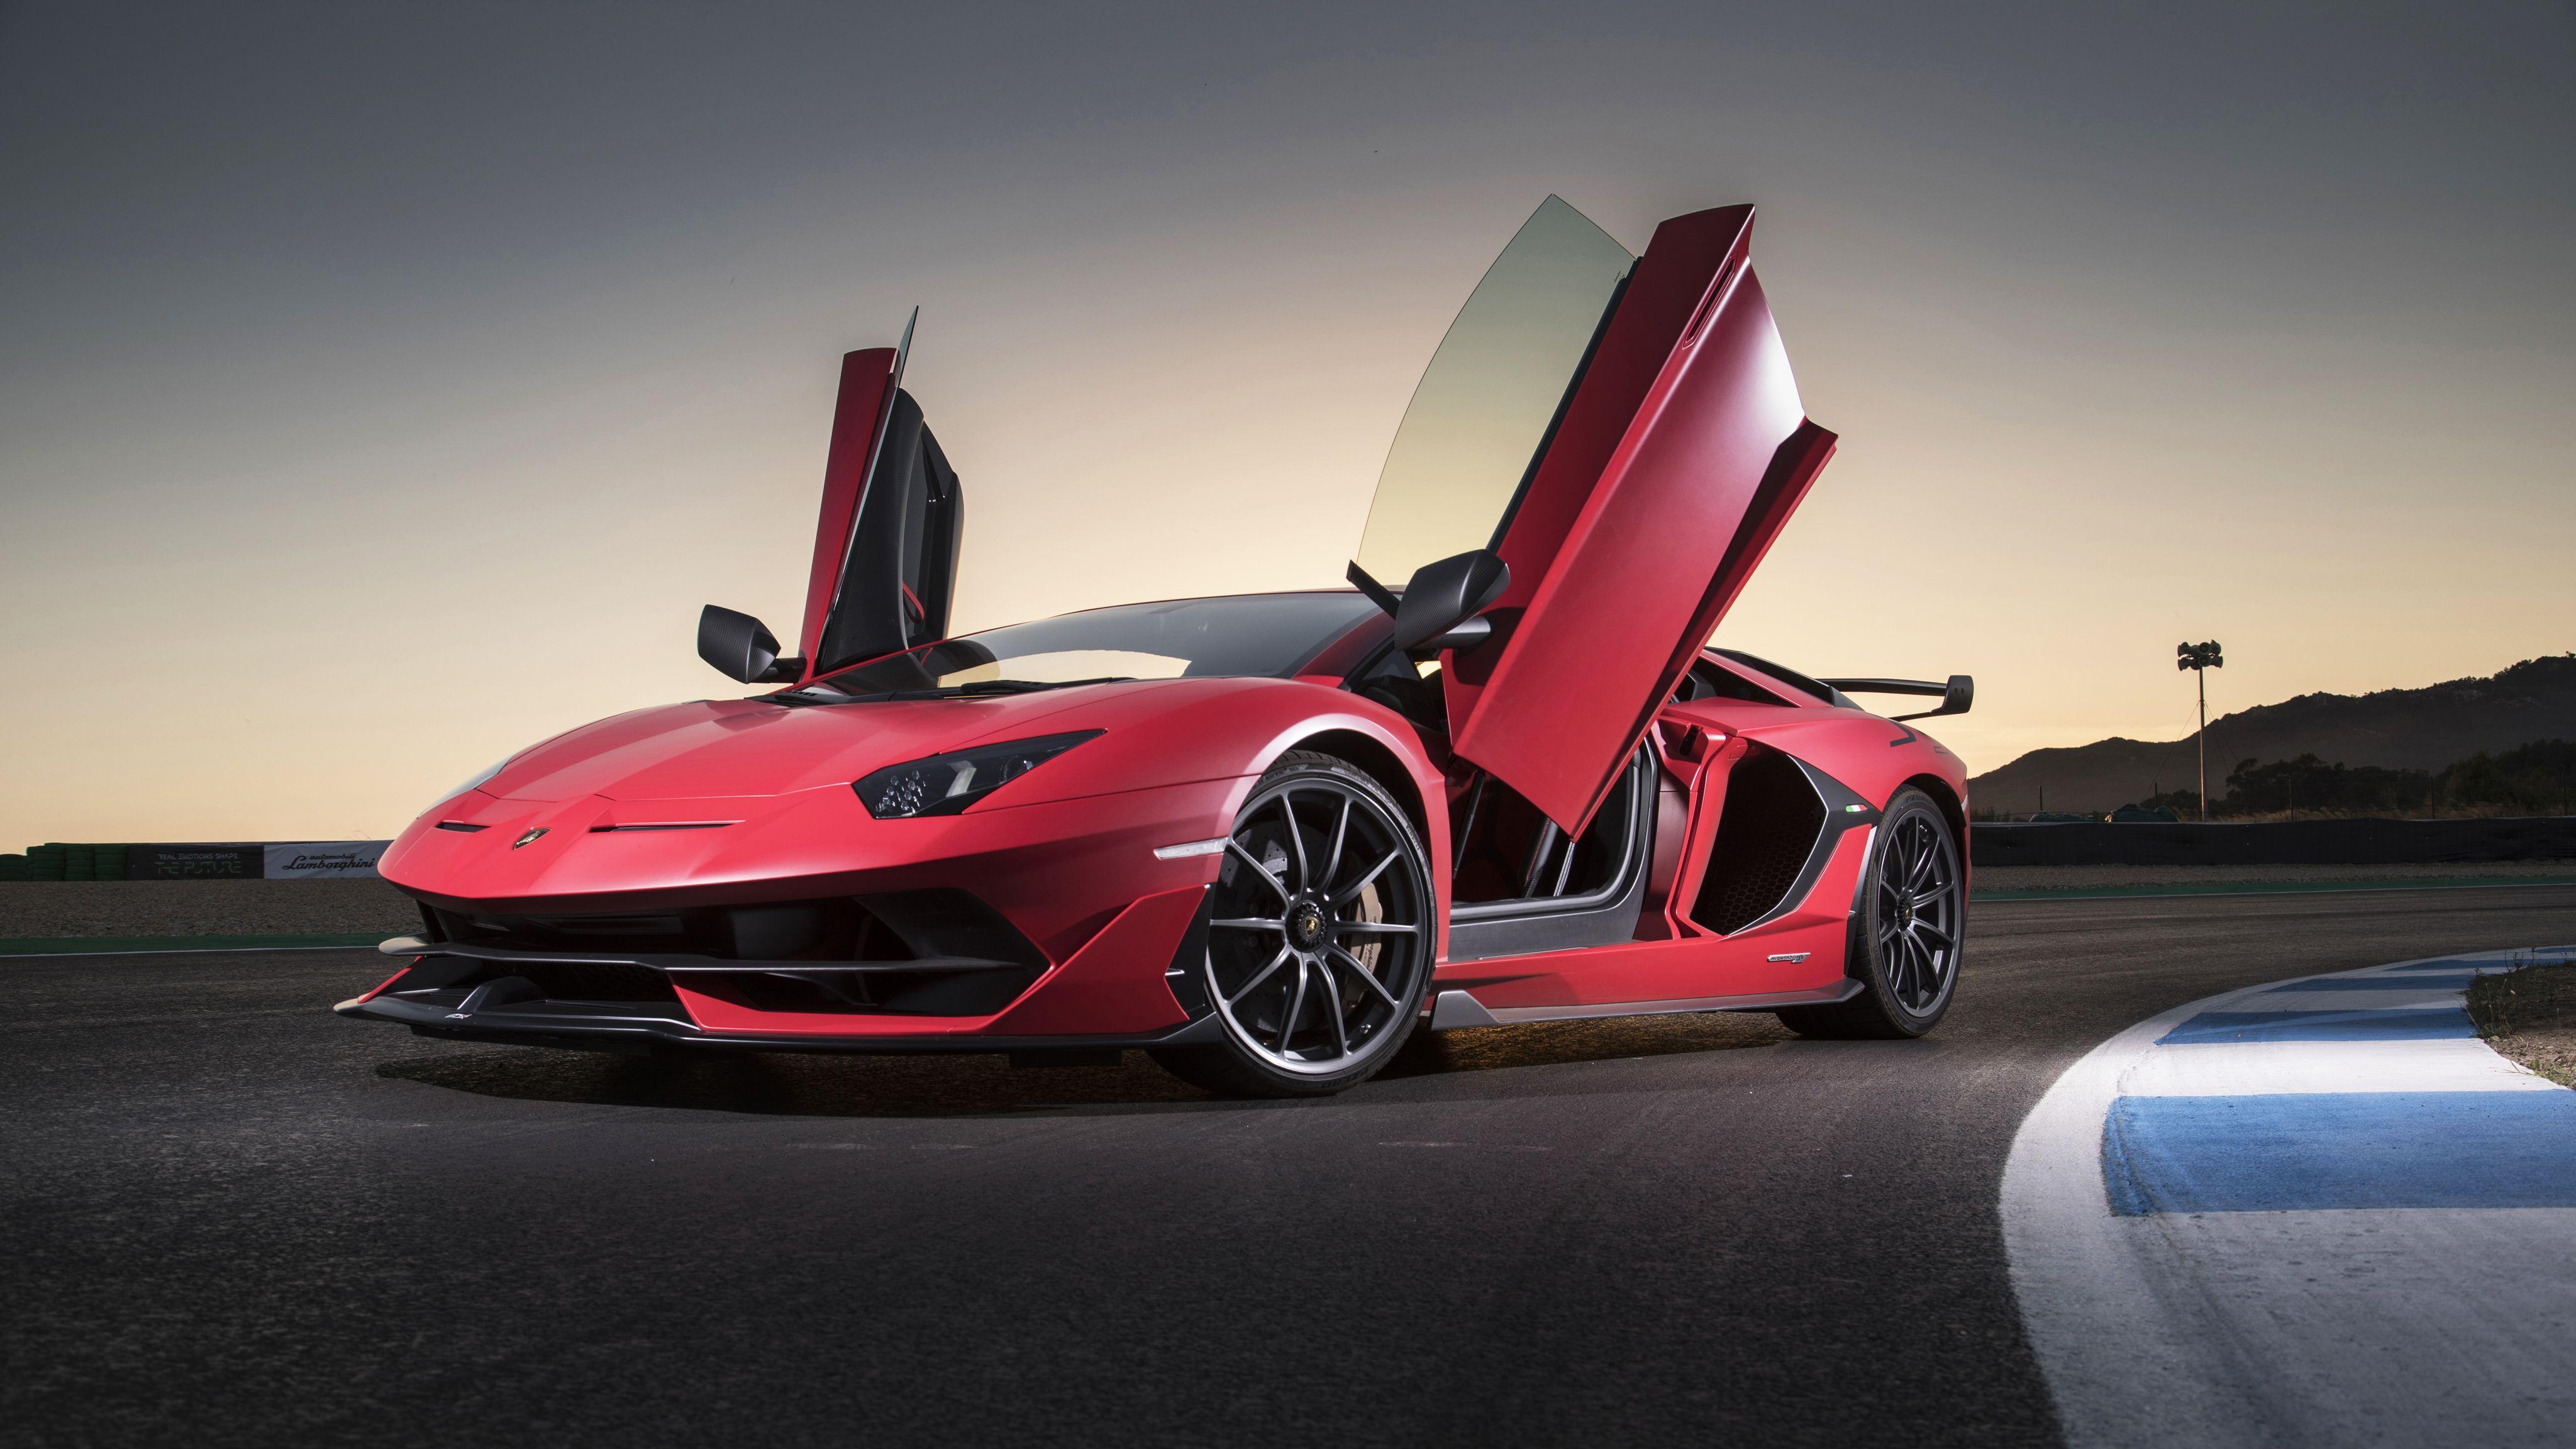 Lamborghini Aventador Svj 2019 4k With Images Lamborghini